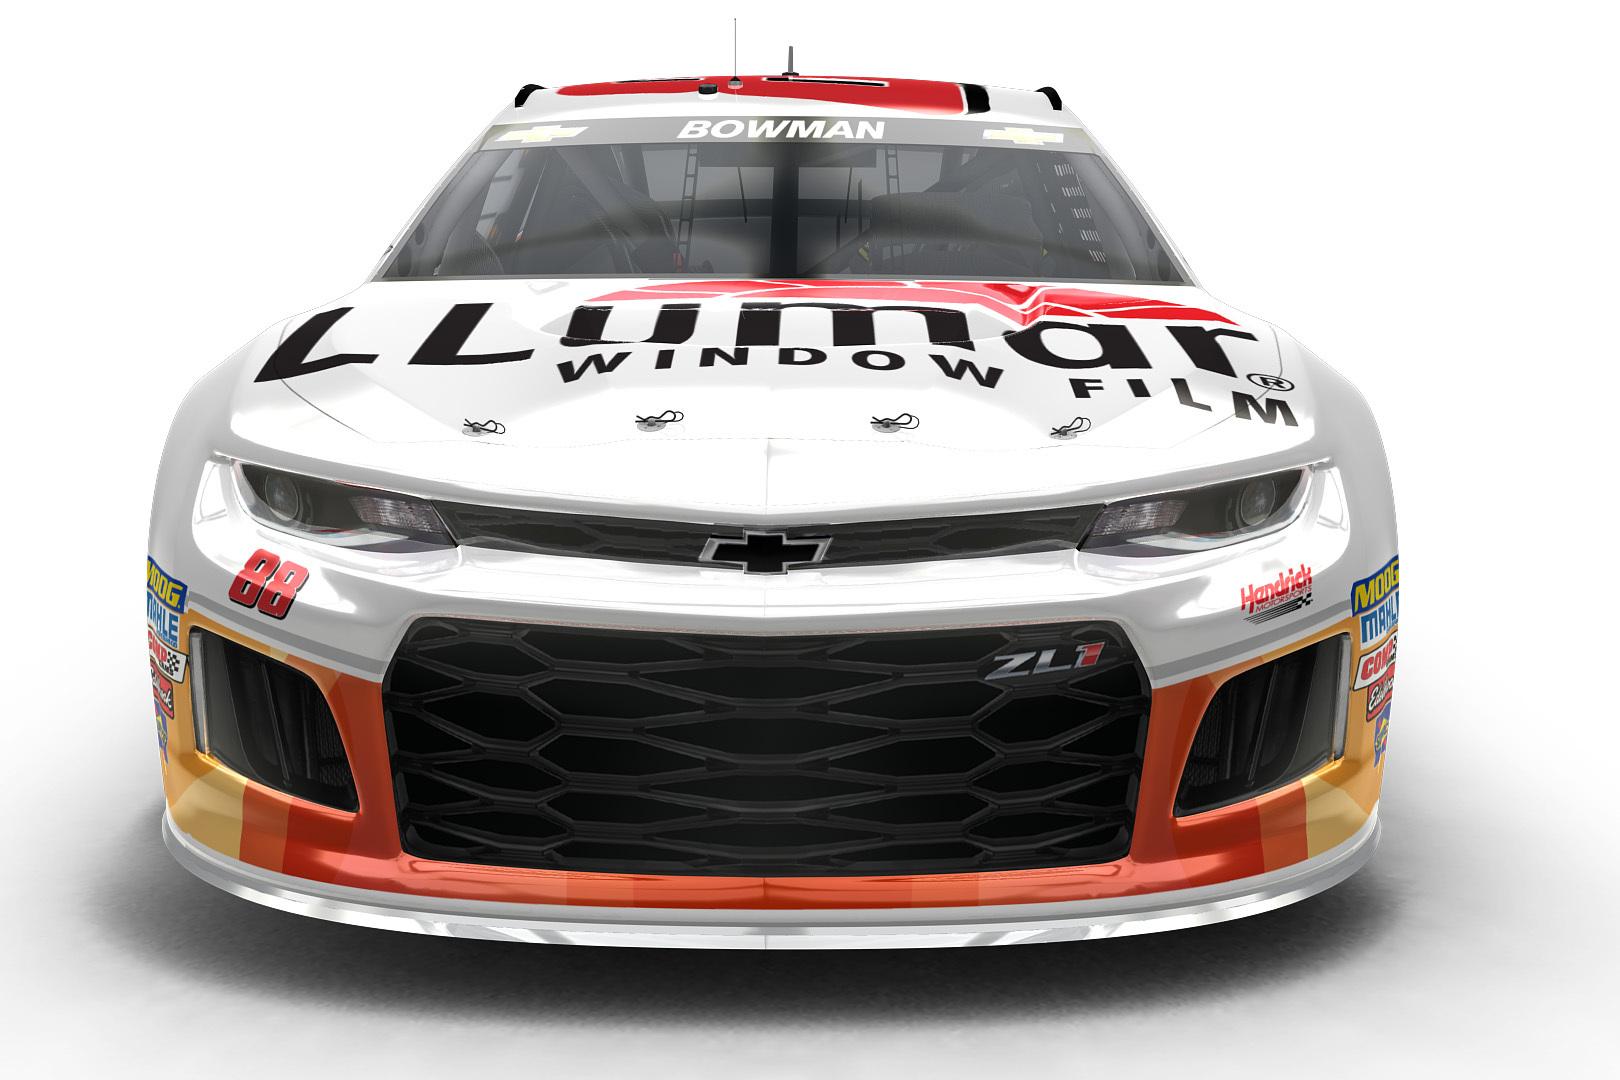 Brand-new LLumar paint scheme released | Hendrick Motorsports